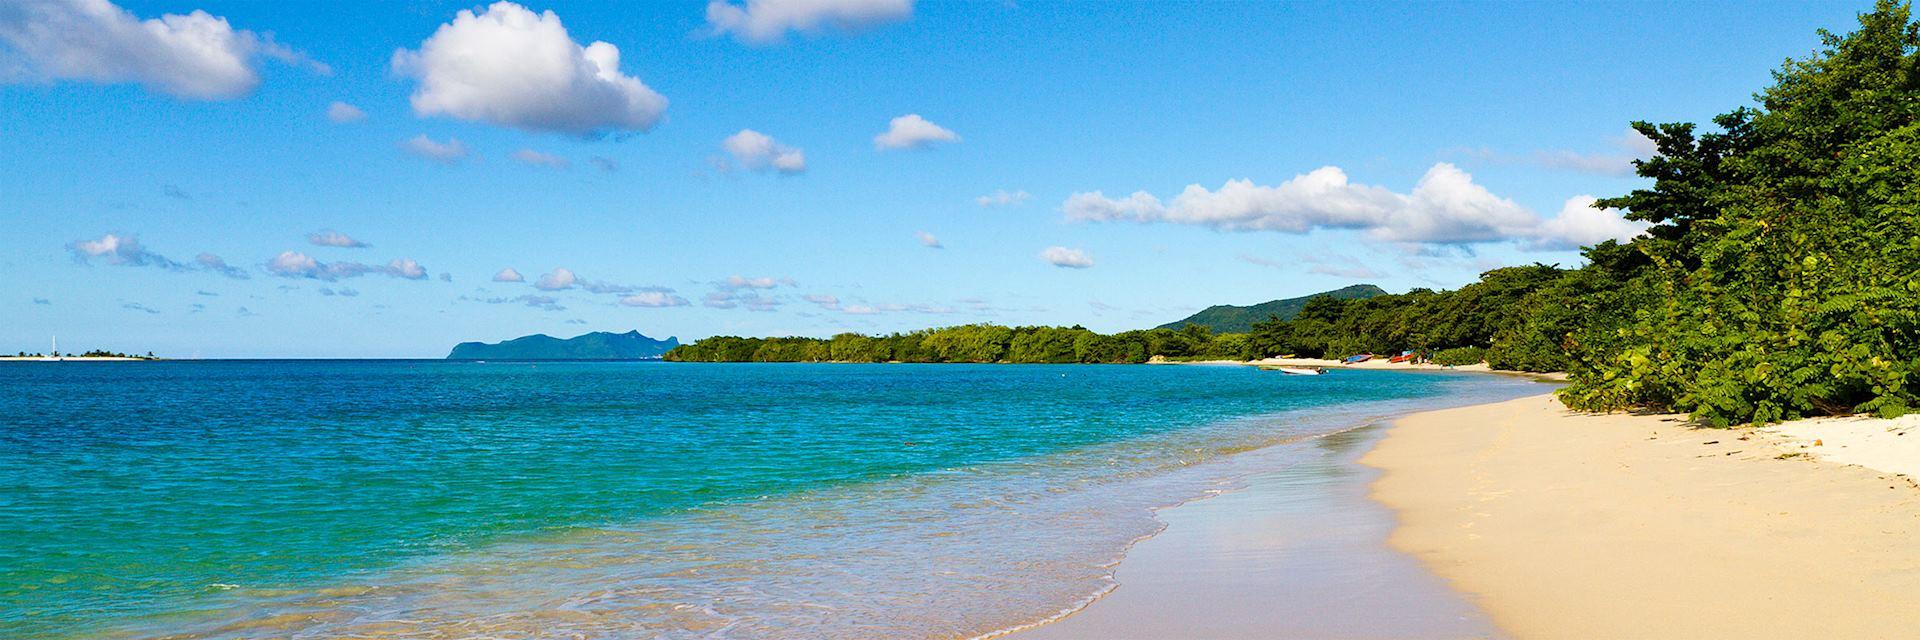 Caribbean beach, Grenada